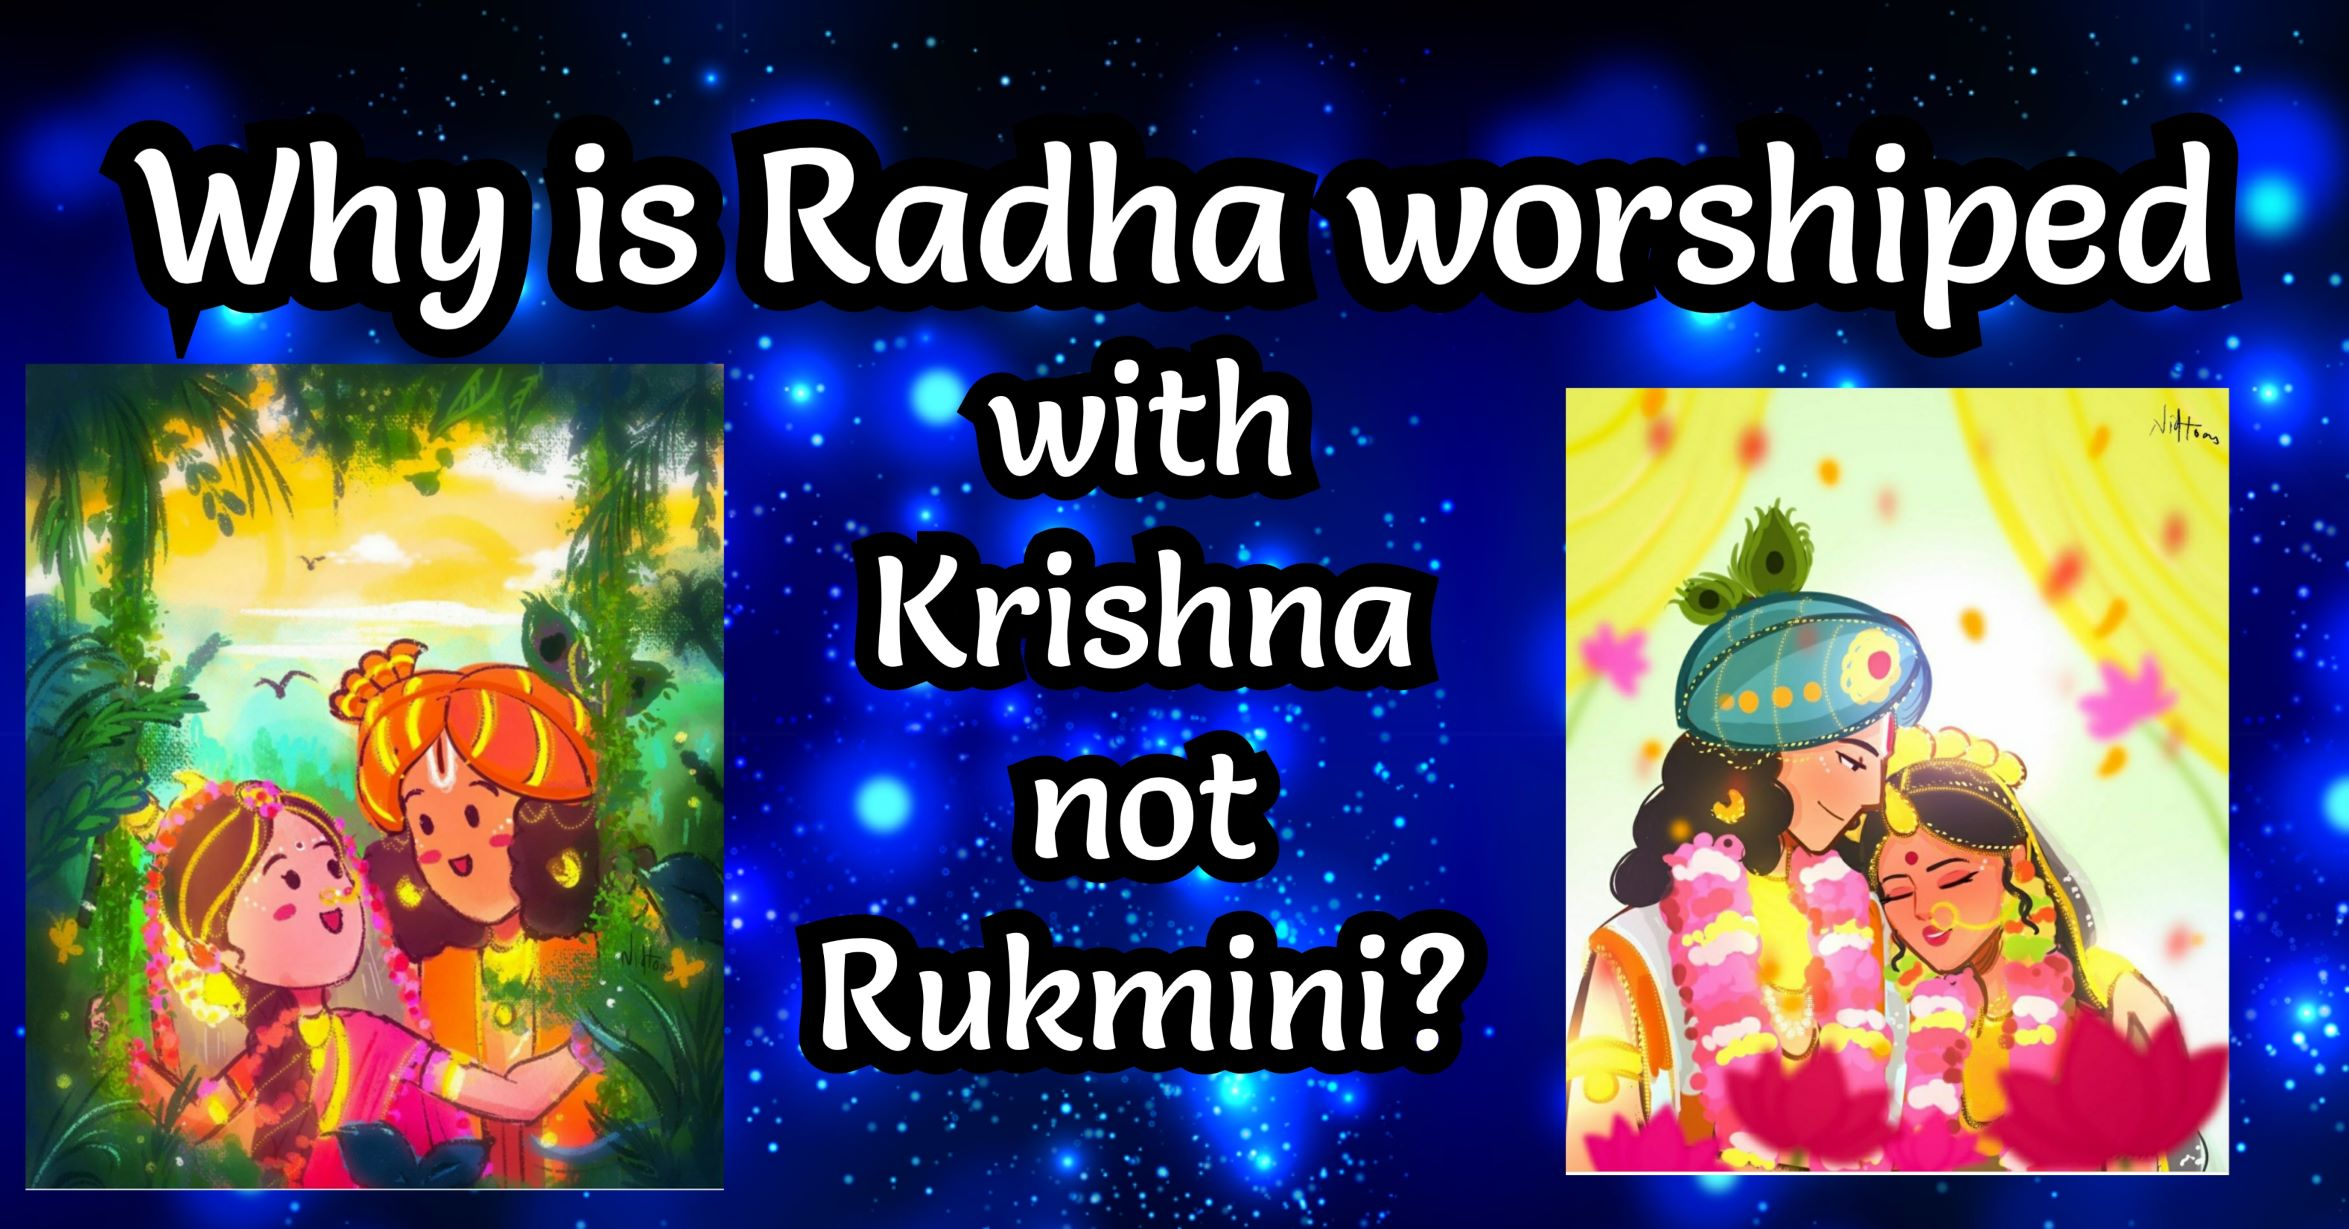 Why is Radha worshiped with Krishna instead of Rukmini?